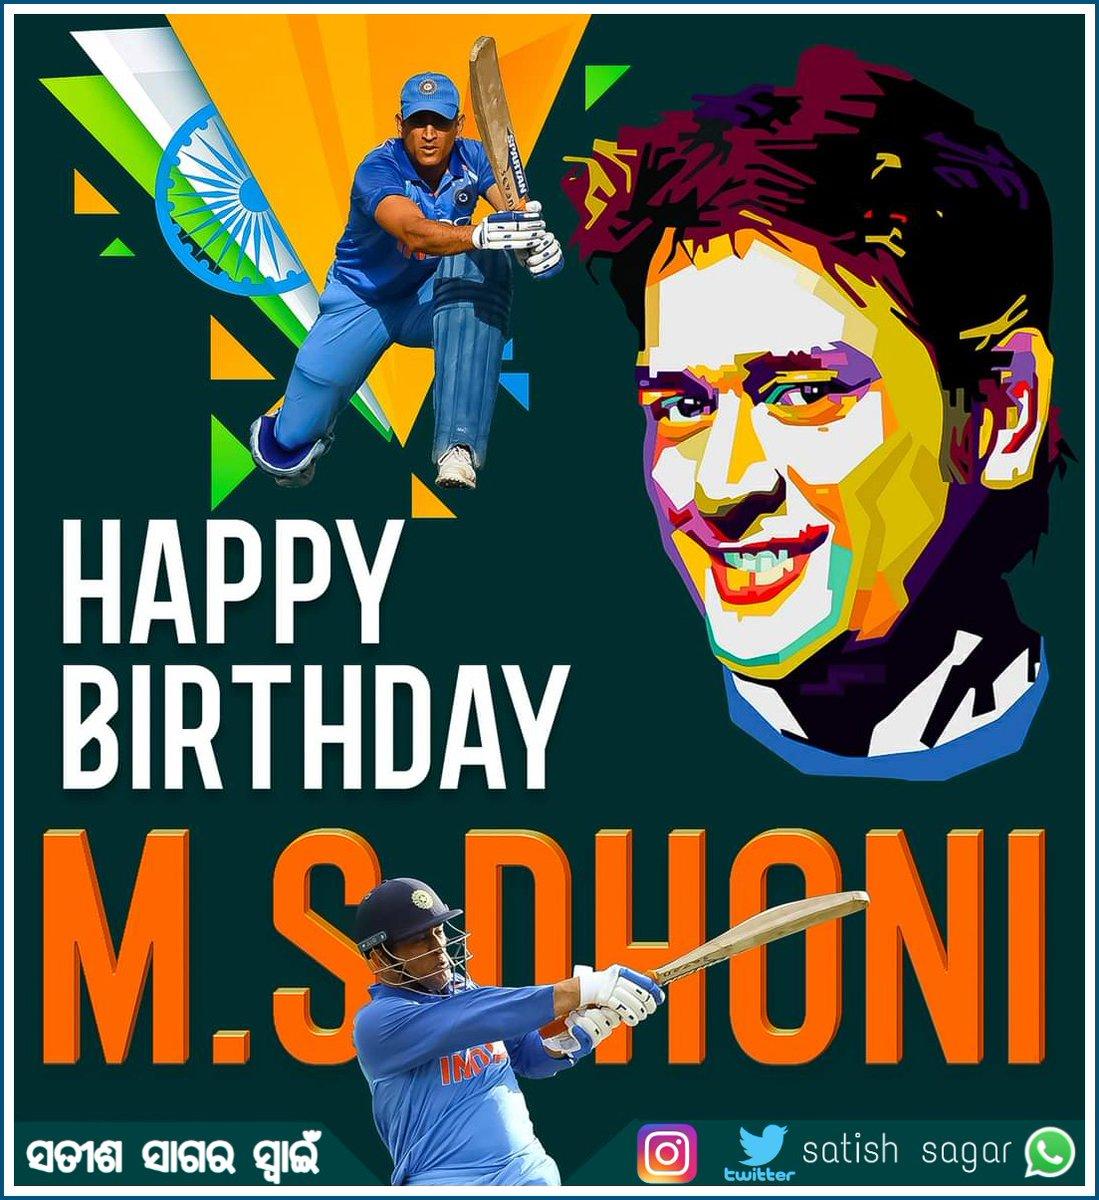 Wishing Padma Bhushan, Padma Shri and Rajiv Gandhi Khel Ratna Awardee and former captain of the Indian cricket team Sj #MahendraShingDhoni a very very happy birthday .pic.twitter.com/4HLcASfsKc